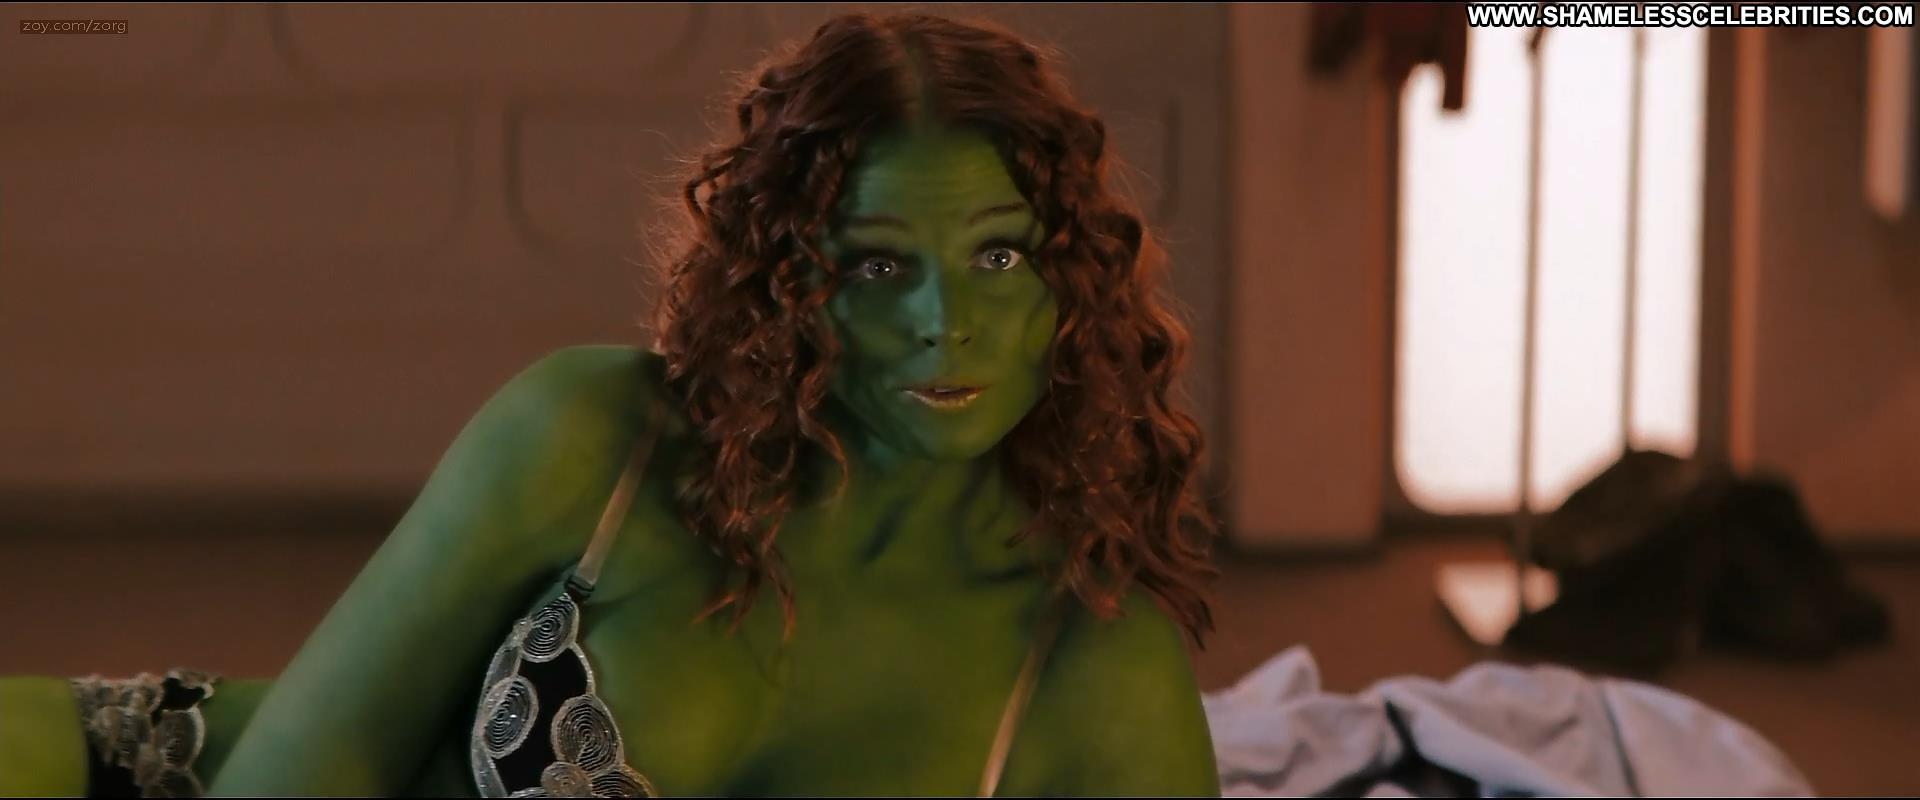 Zoe Saldana Rachel Nichols Star Trek Celebrity Posing Hot Hot